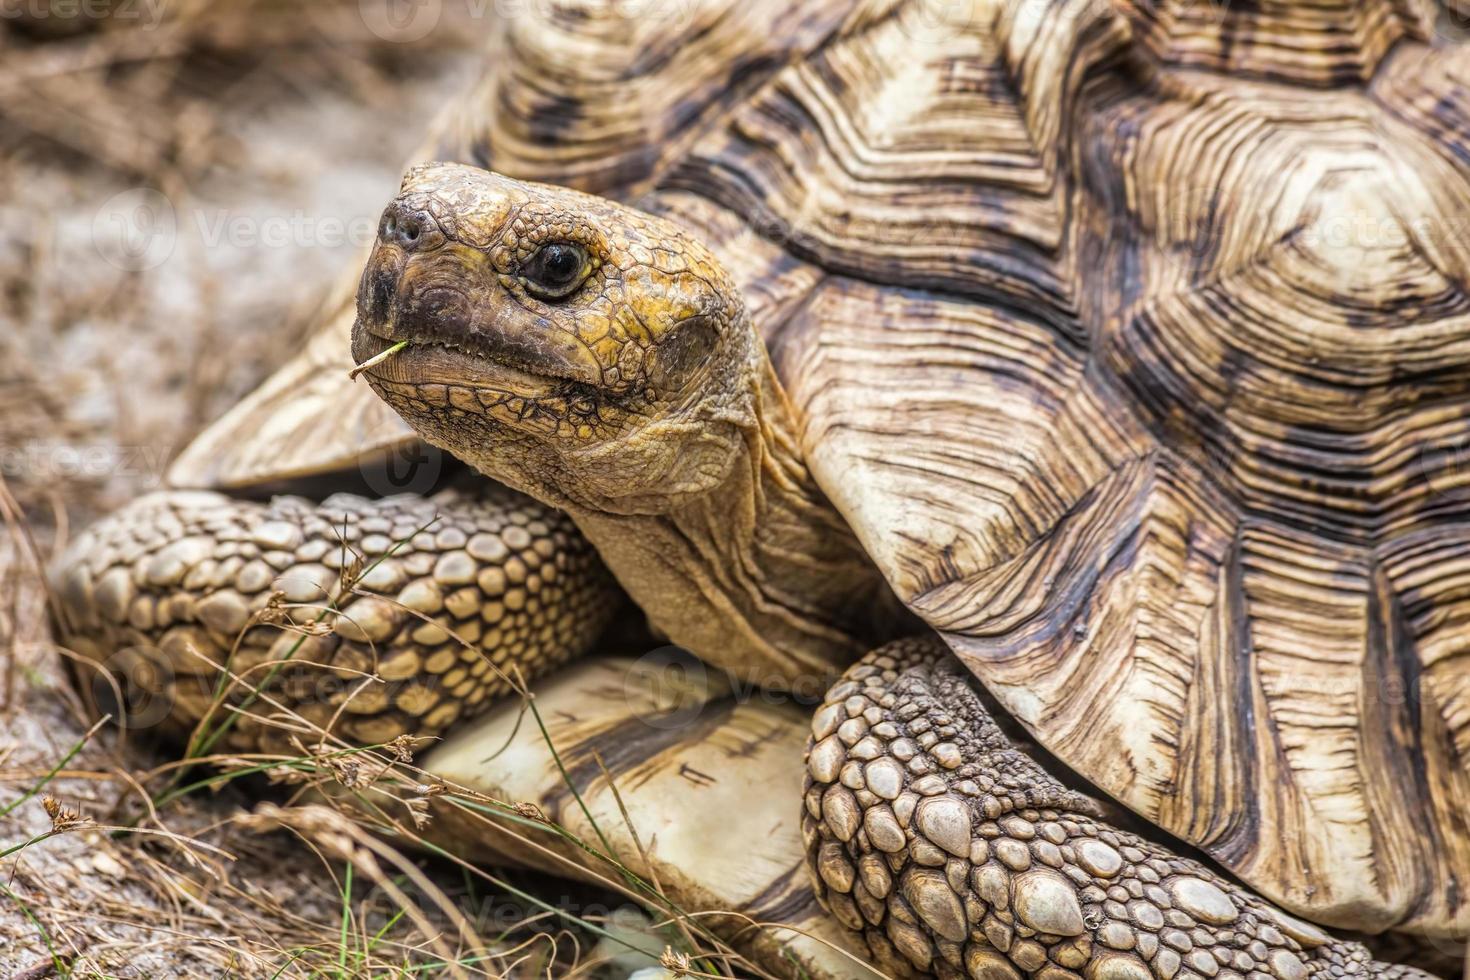 tortuga gigante de aldabra (aldabrachelys gigantea) foto